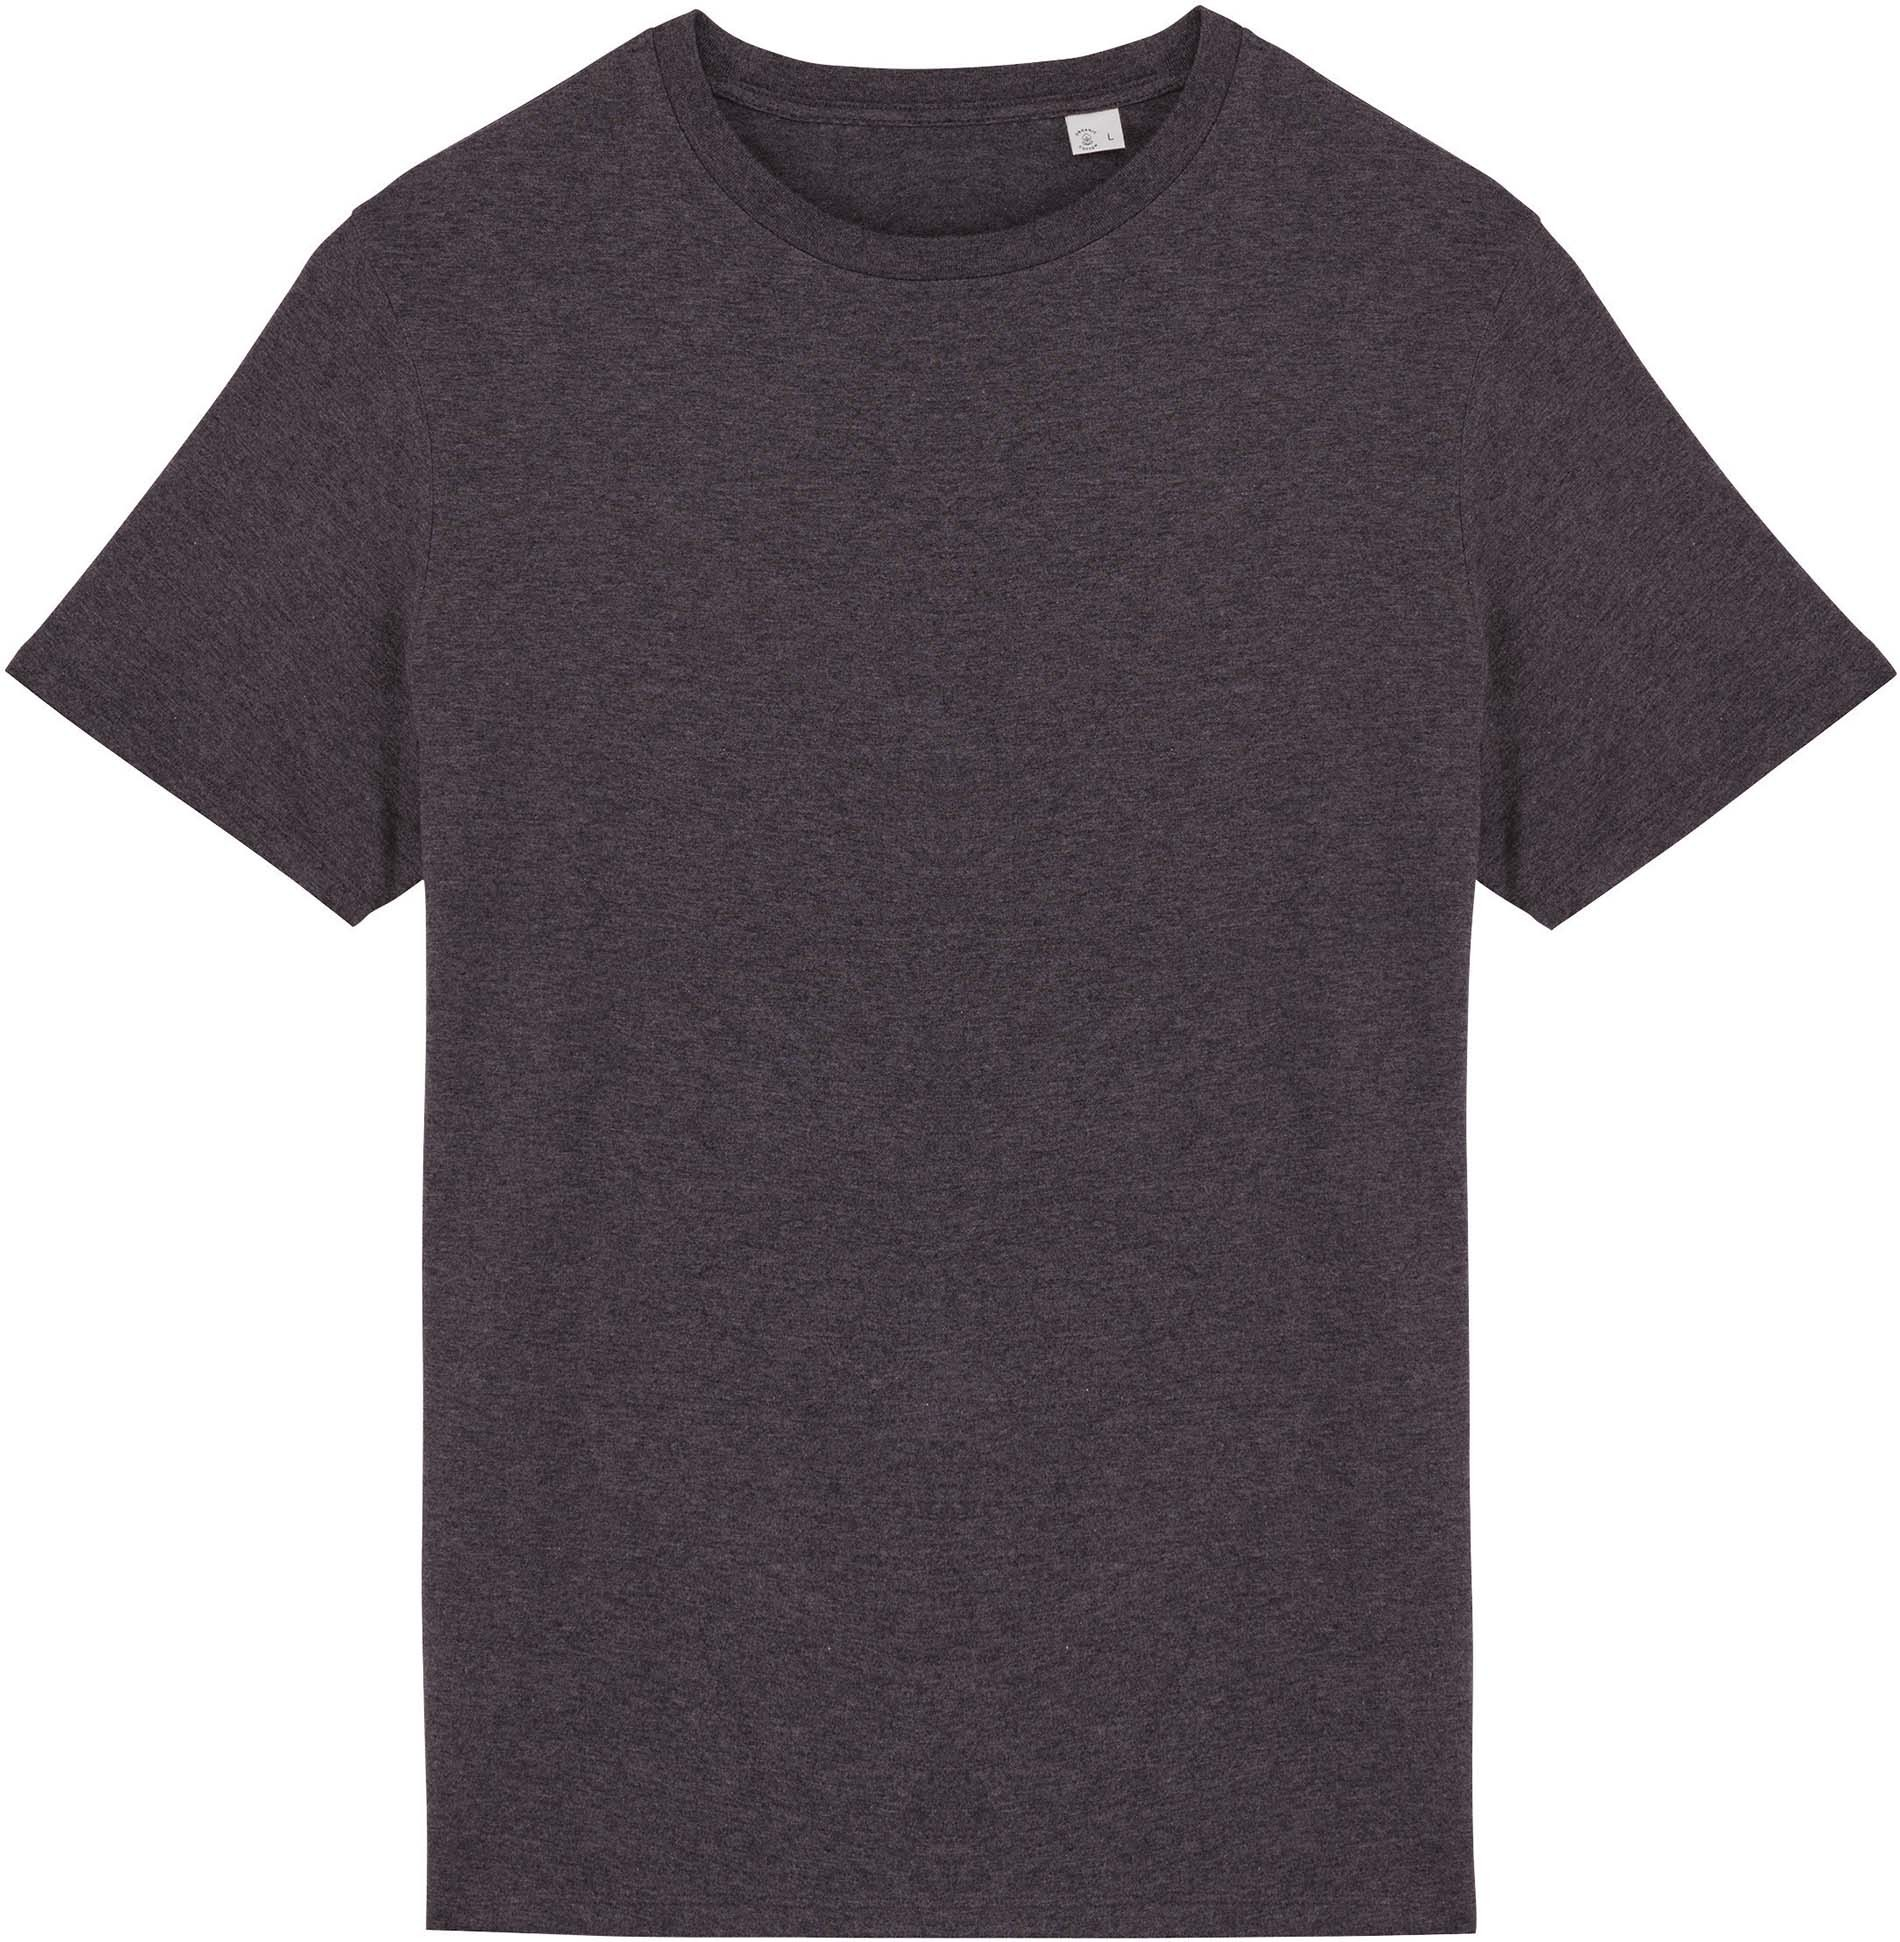 Tee-shirt manches courtes unisexe - 2-1843-28